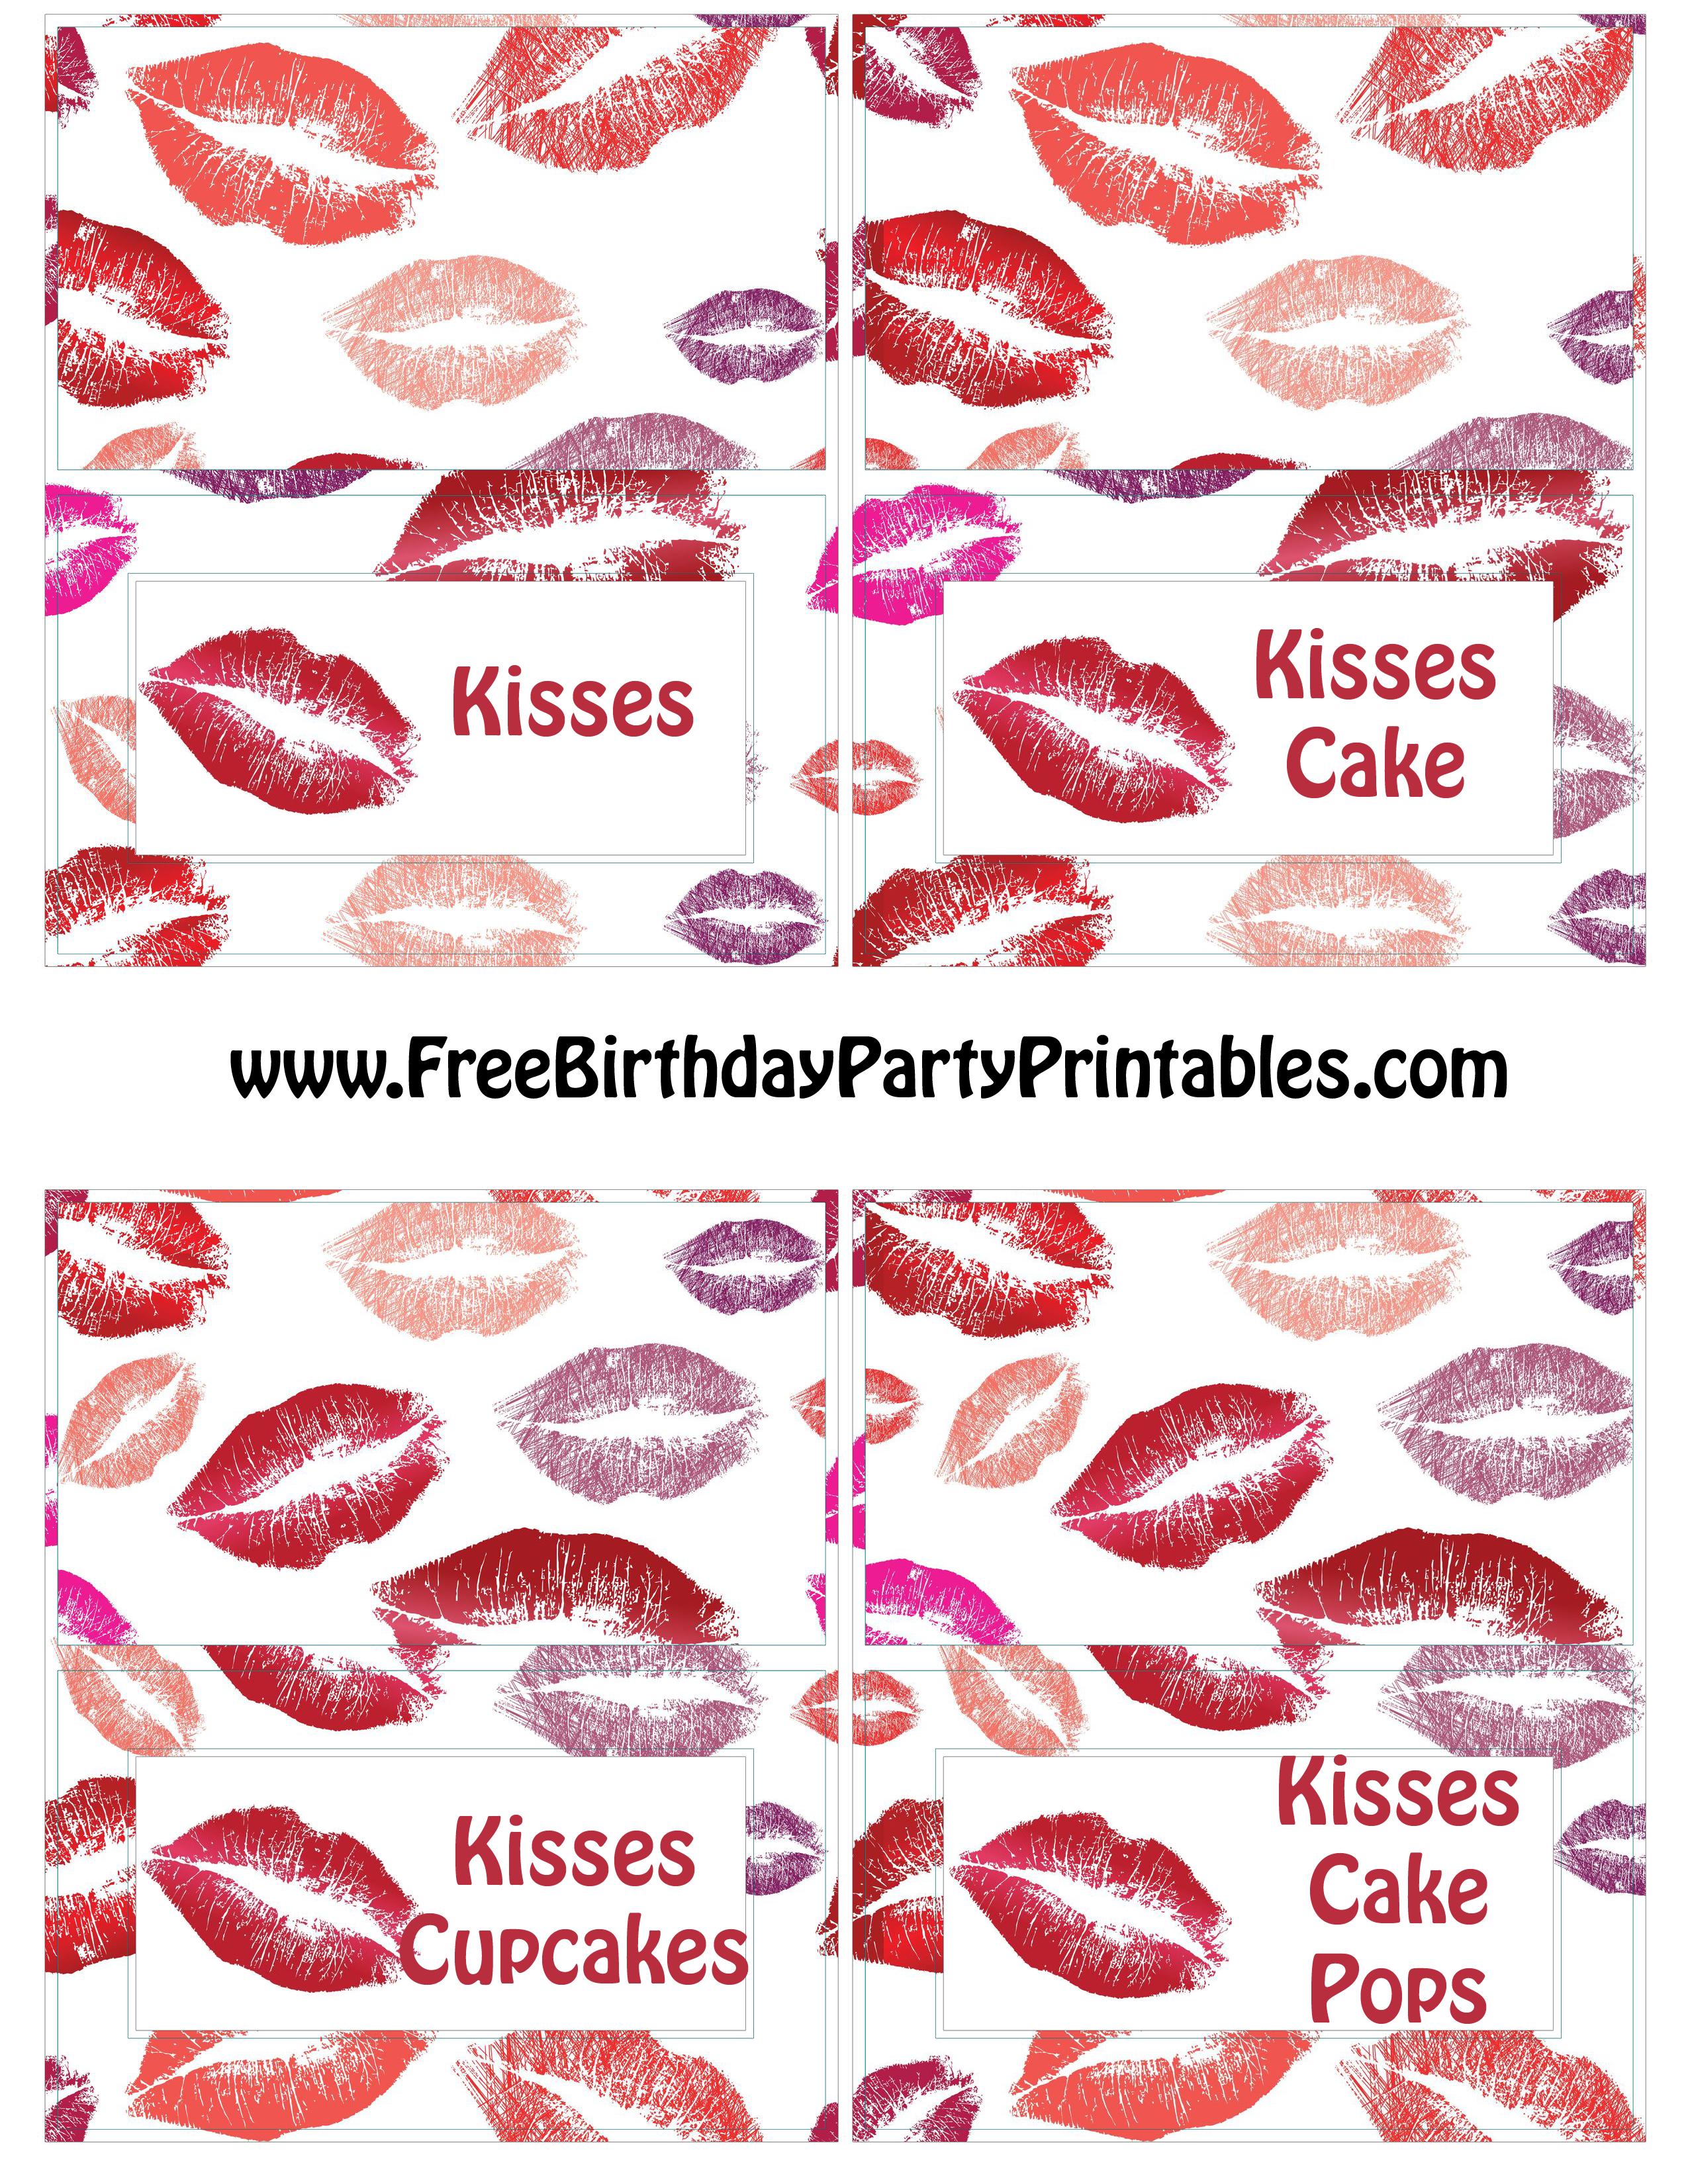 Free Lipstick Kiss Birthday Party Printables Food Cards  Kisses, Kisses  Cake, Kisses Cupcakes, Kisses Cake Pops  Free Birthday Card Printable Templates